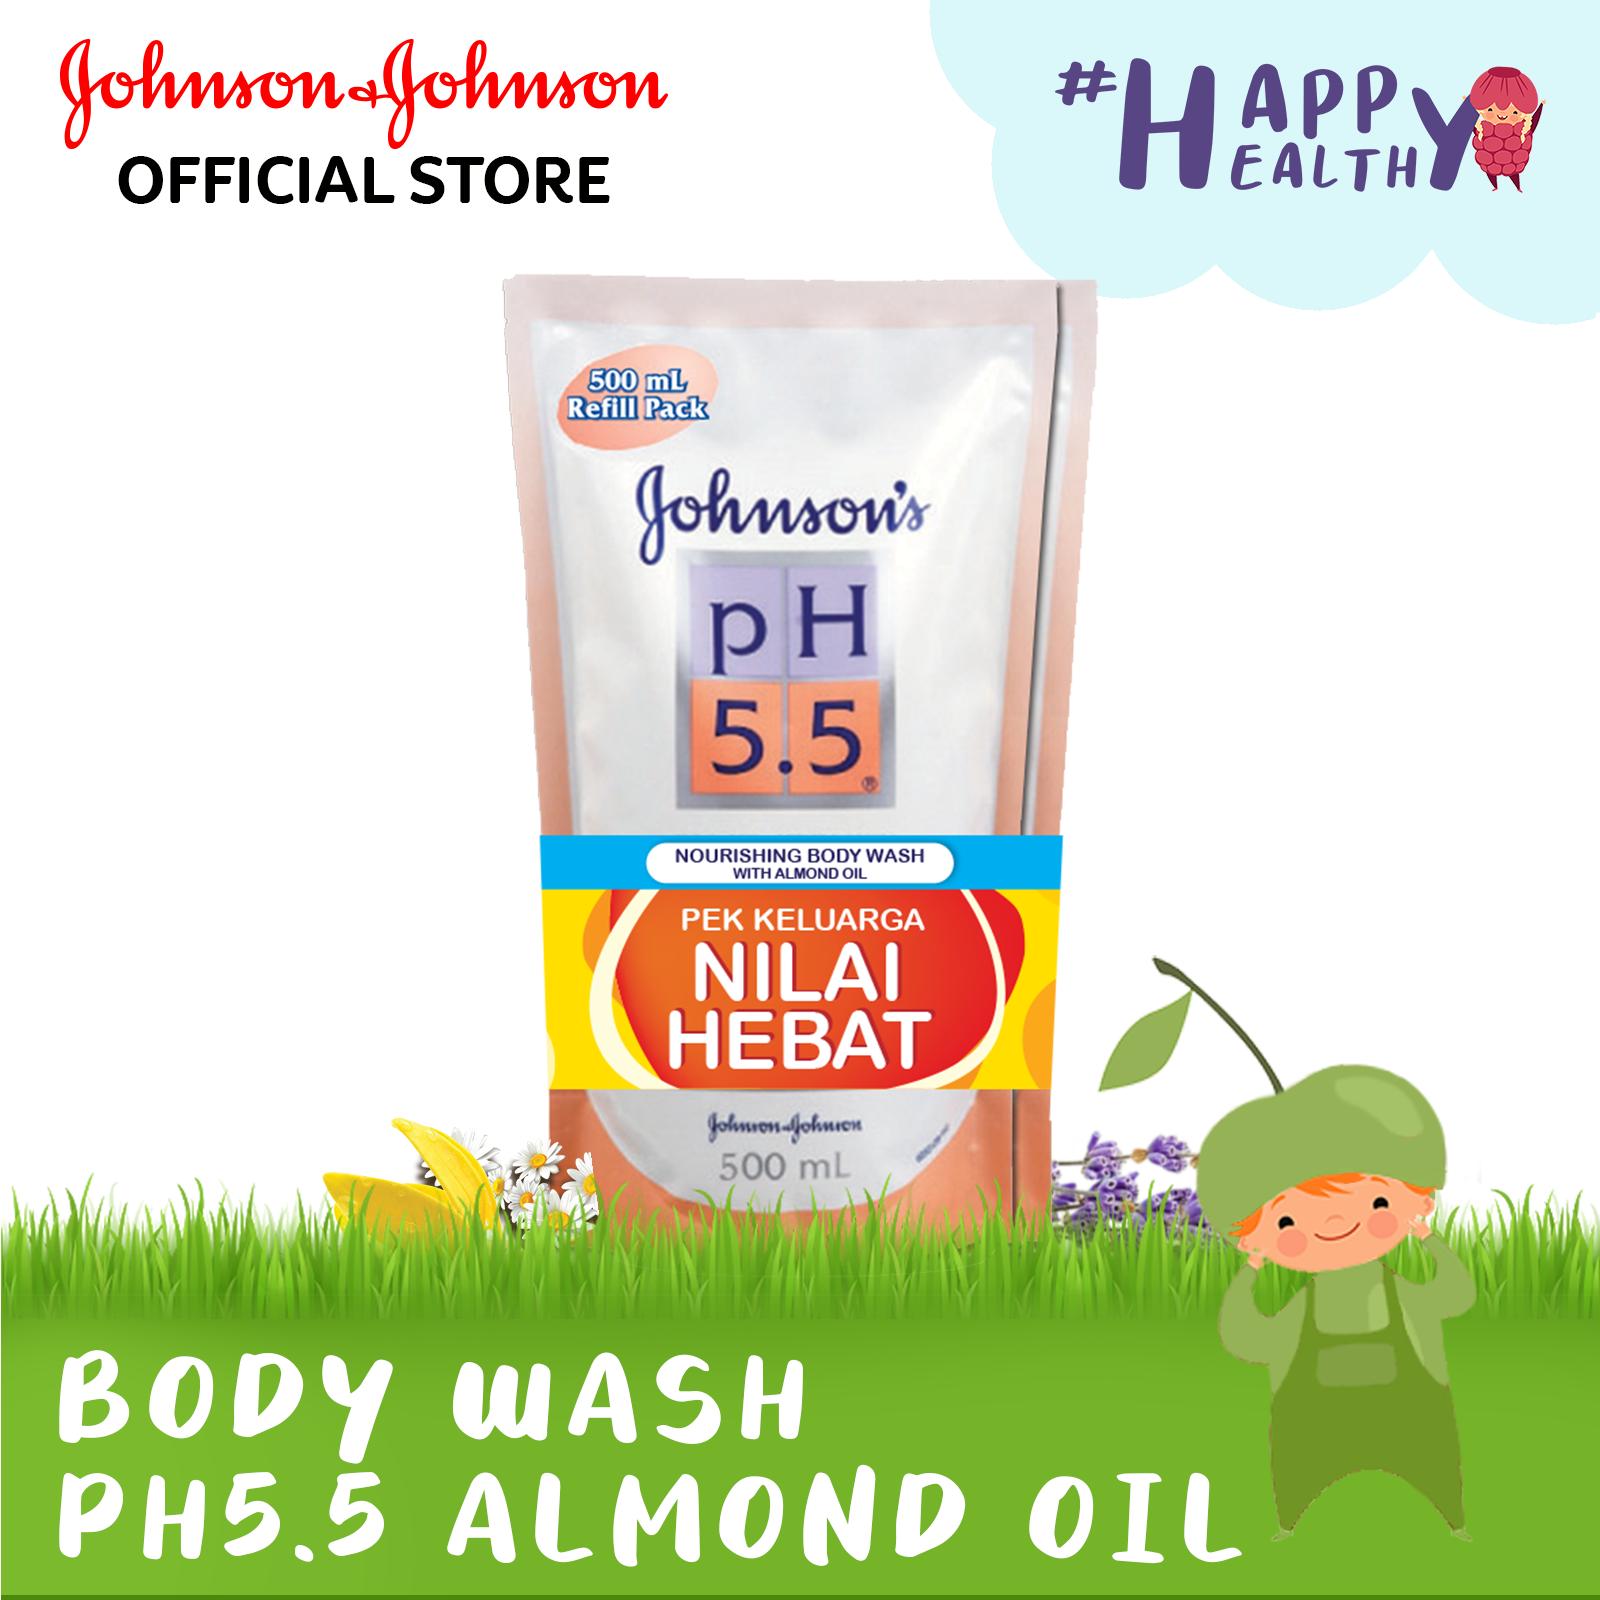 Johnsons PH5.5 Nourishing Almond Oil 500ml Refill [Twin Pack]